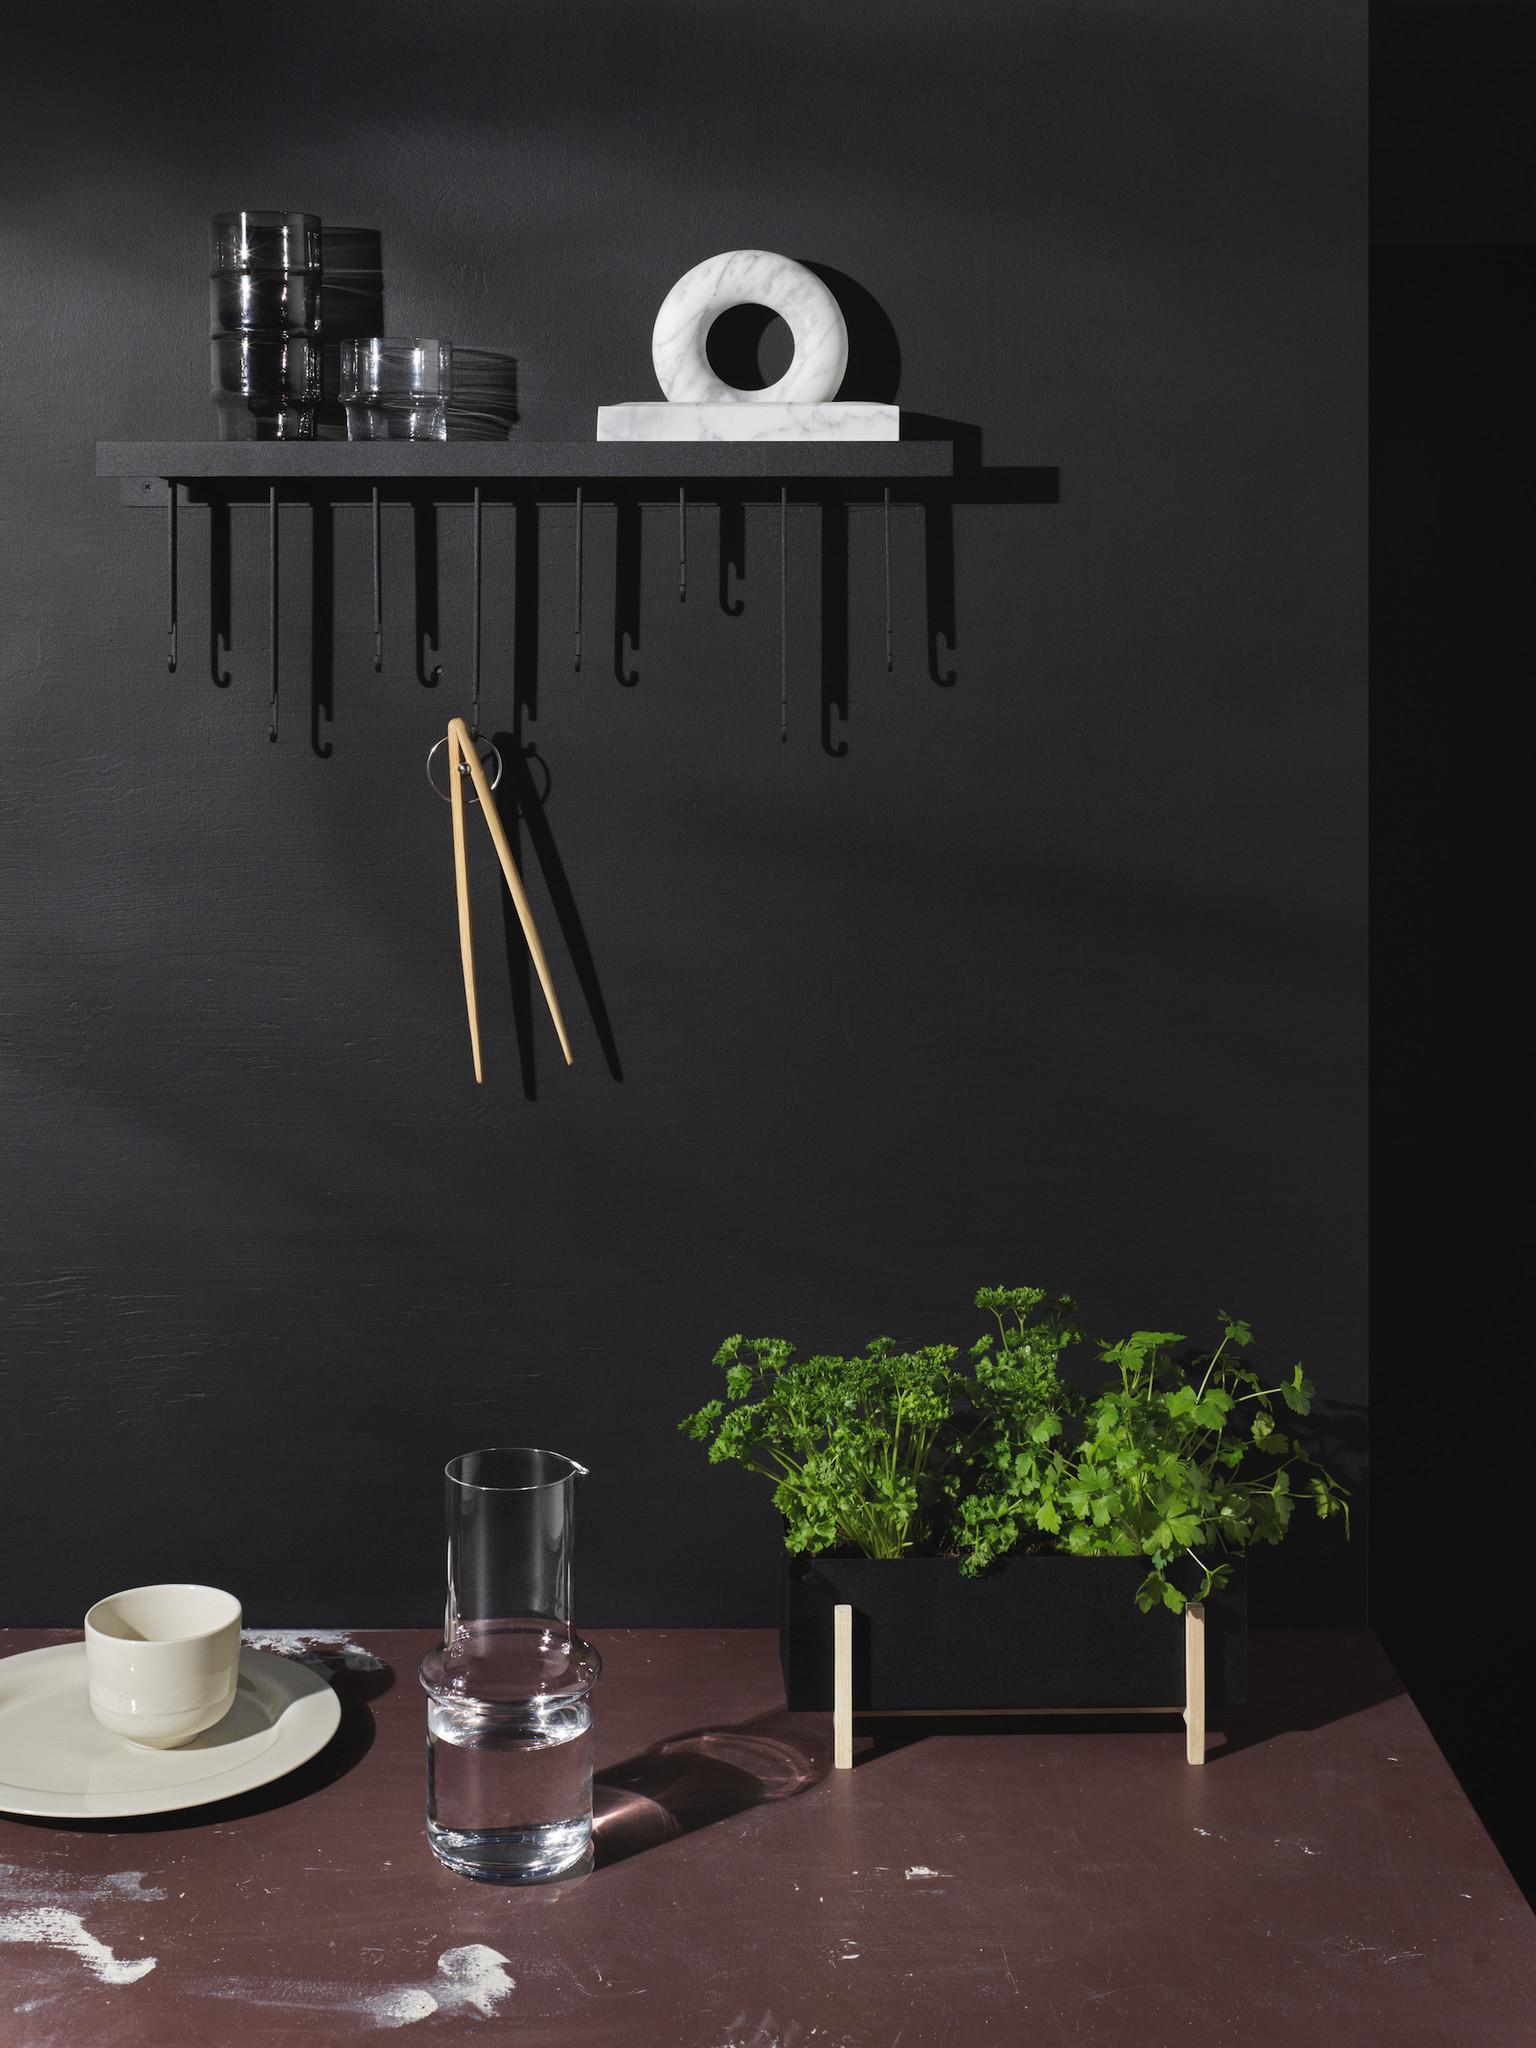 Atelier Wall Hanger-4